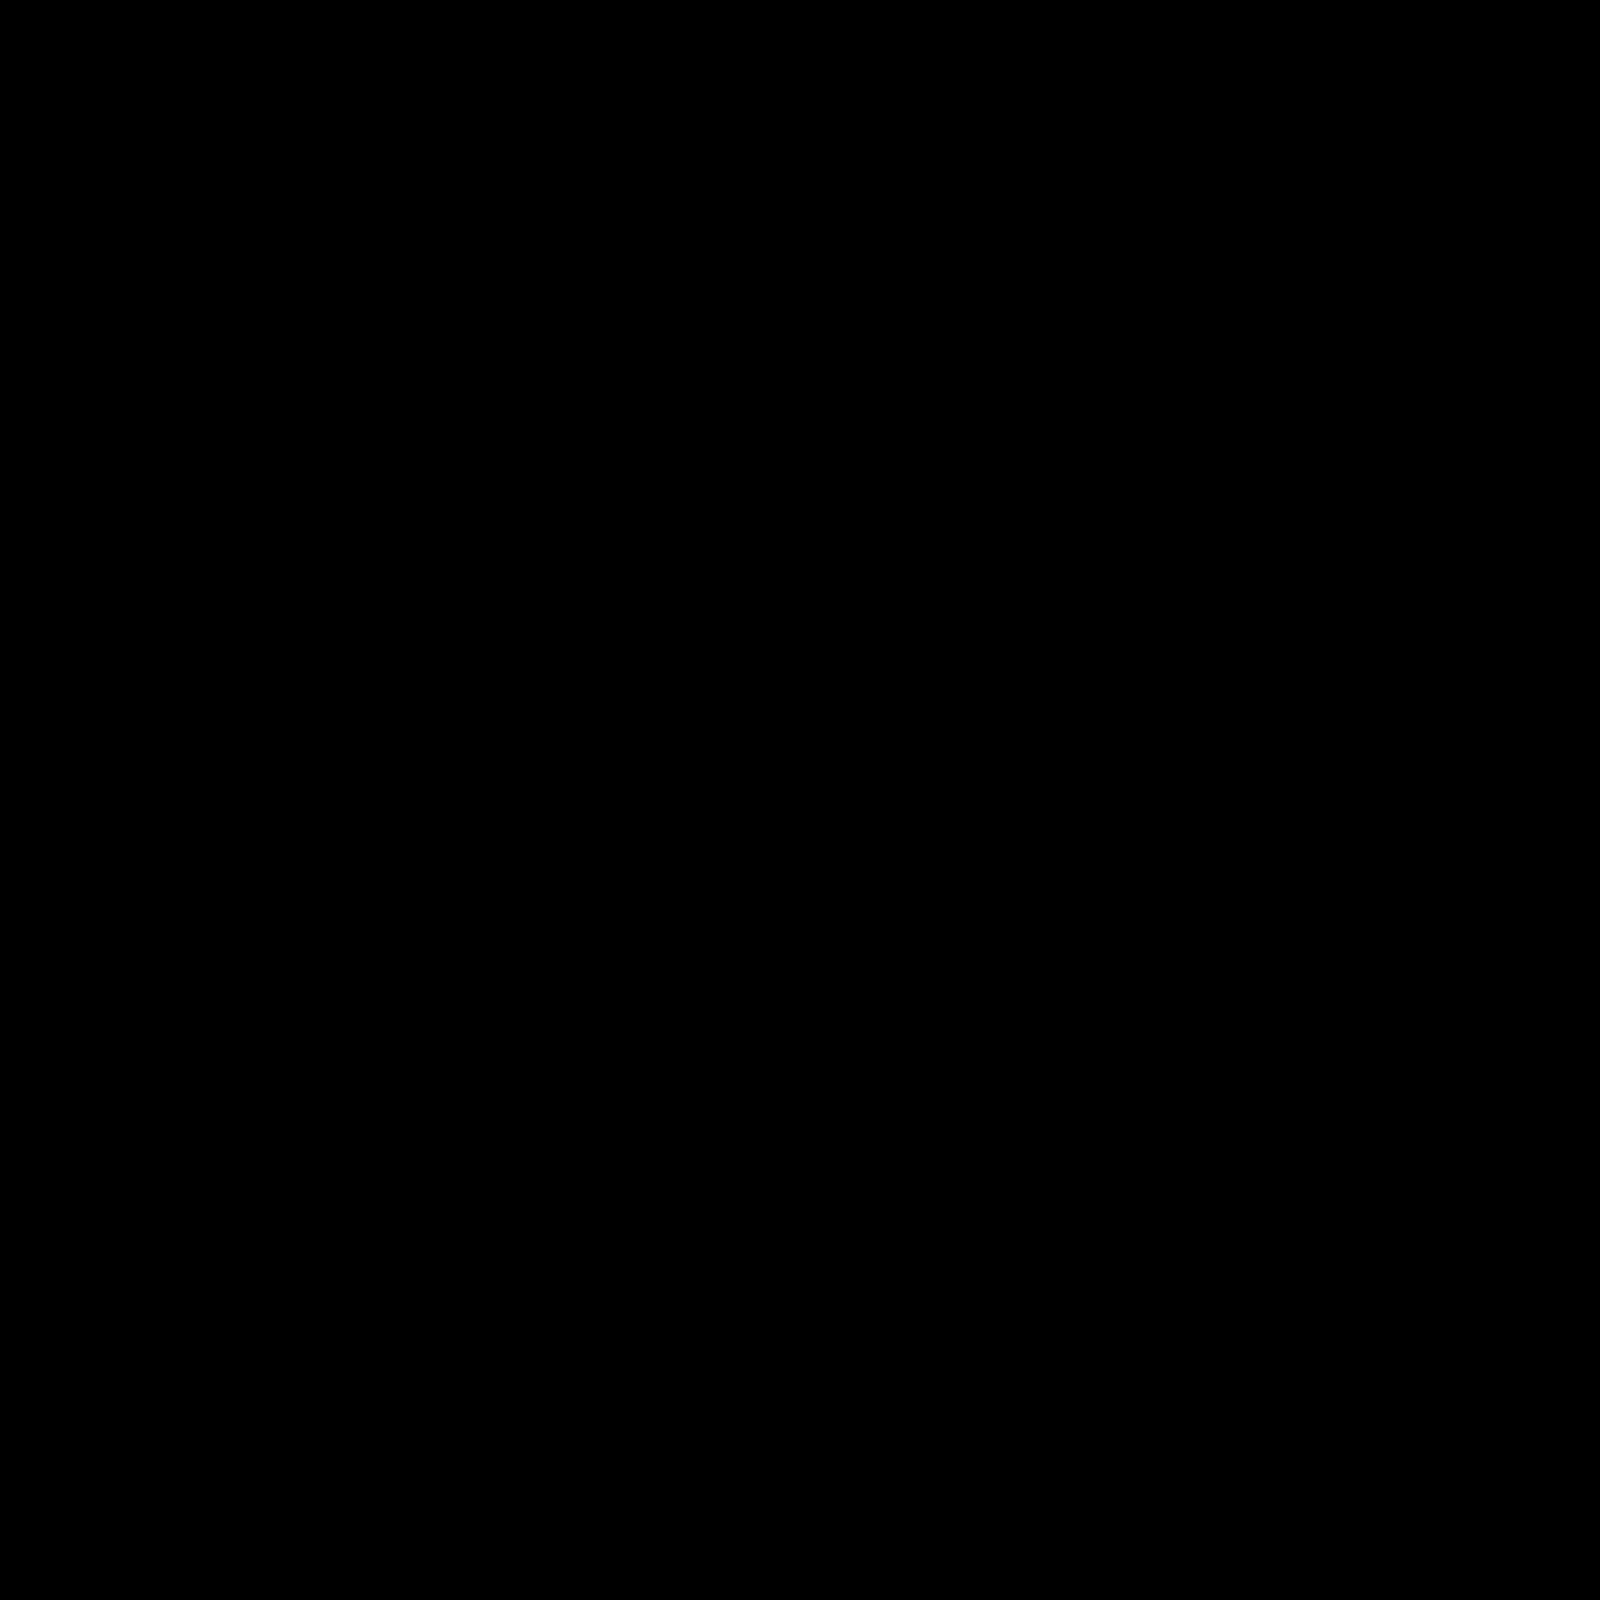 創造性 icon